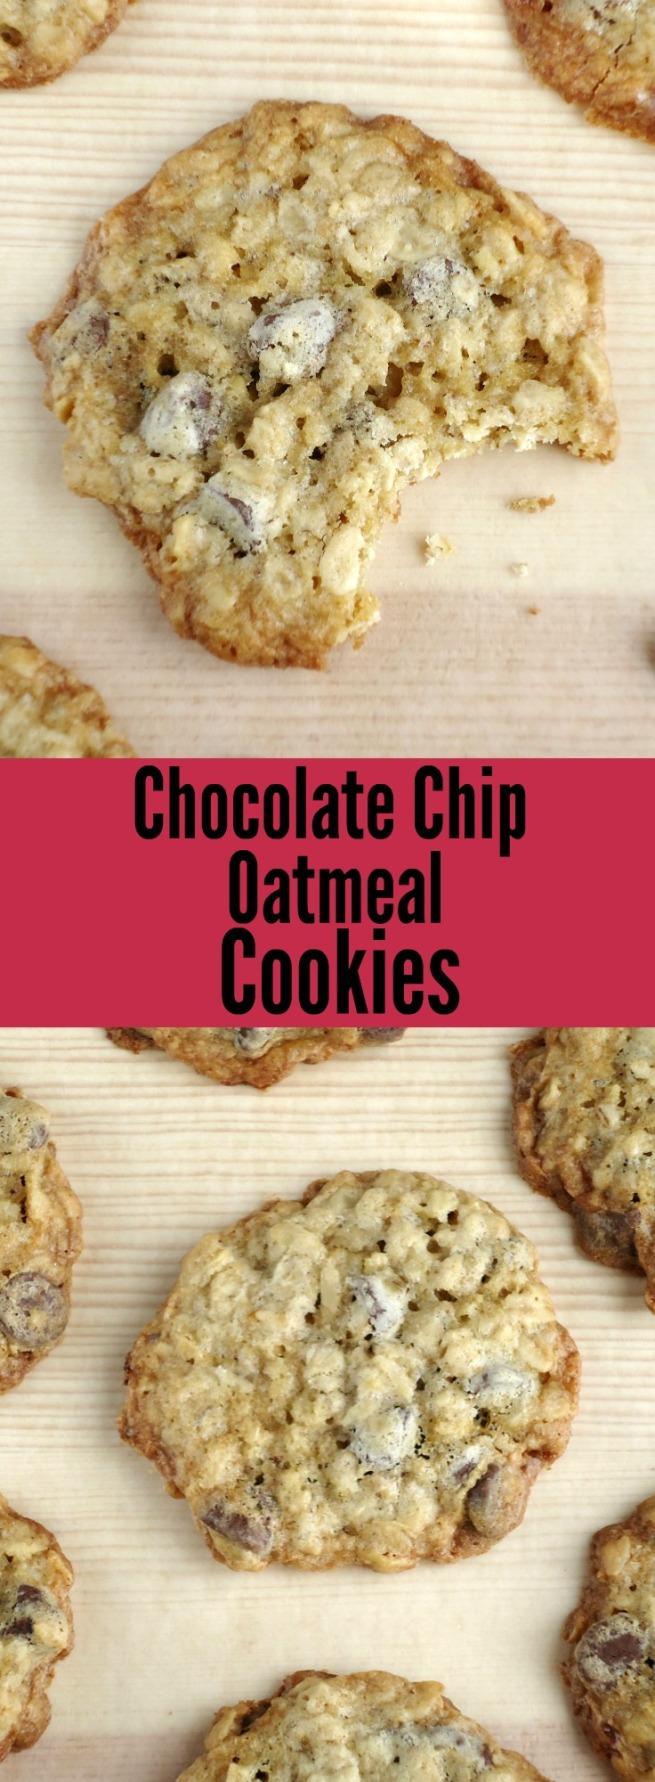 Chocolate Chip Oatmeal Cookies --- Unwed Housewife